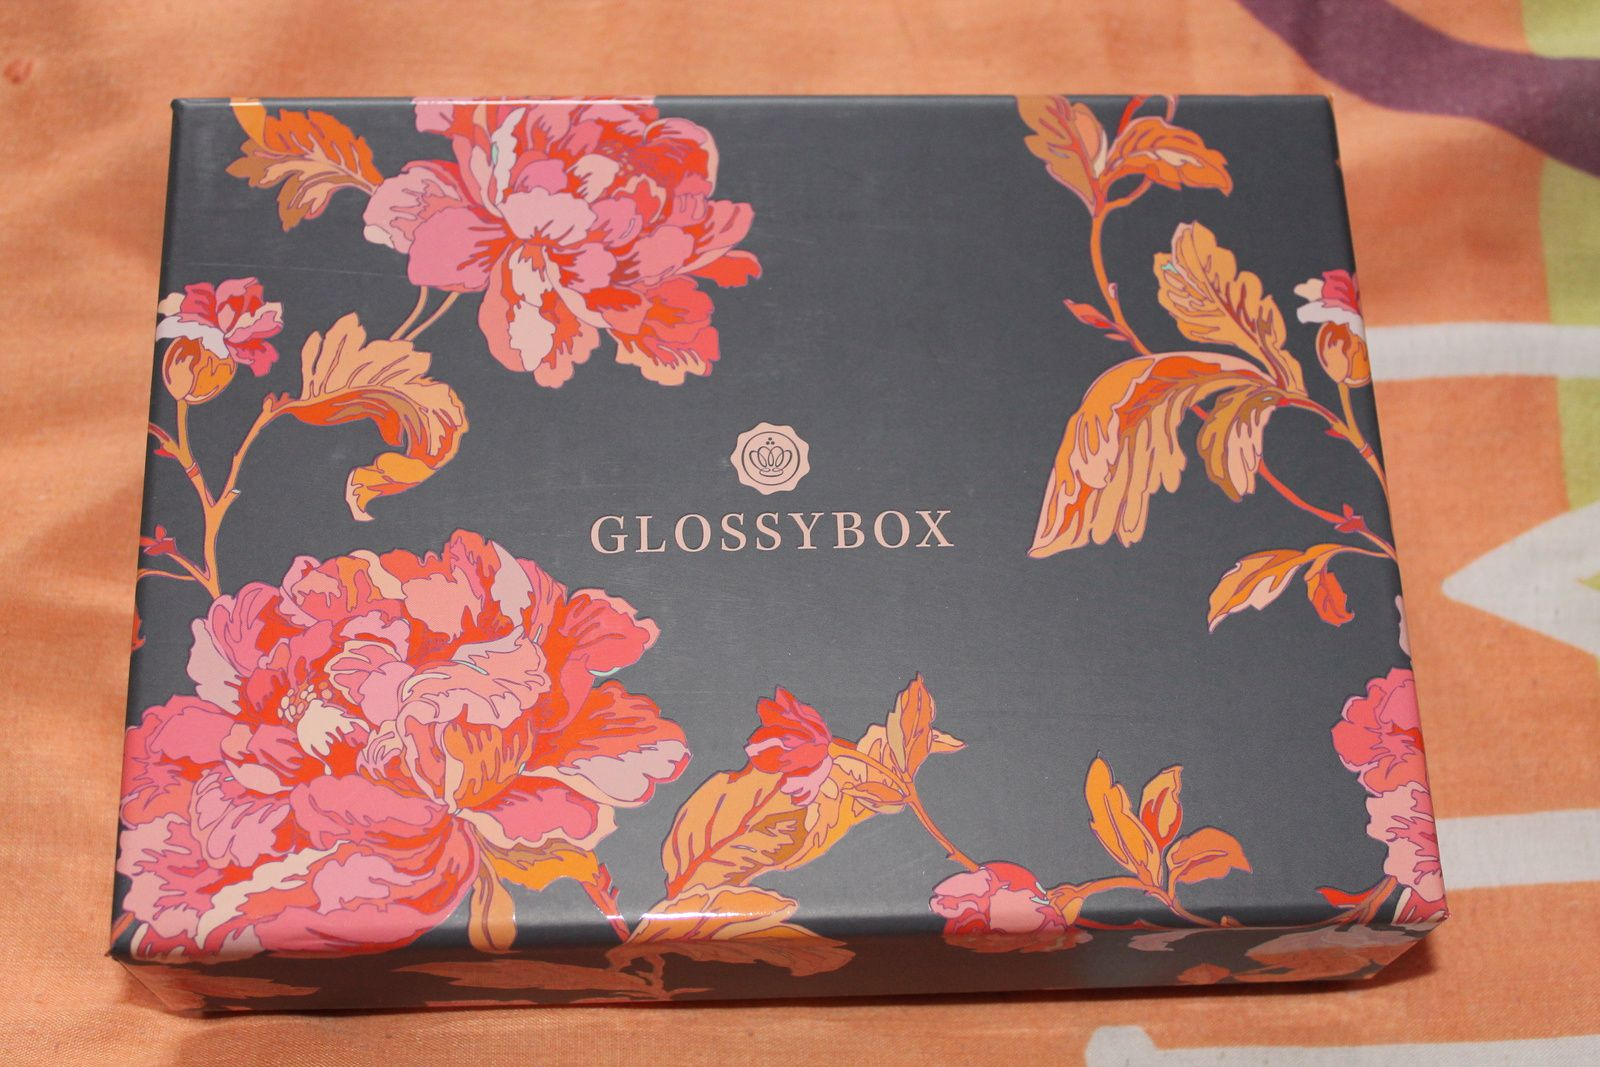 ~ Glossy Box Fêtes des mères ~